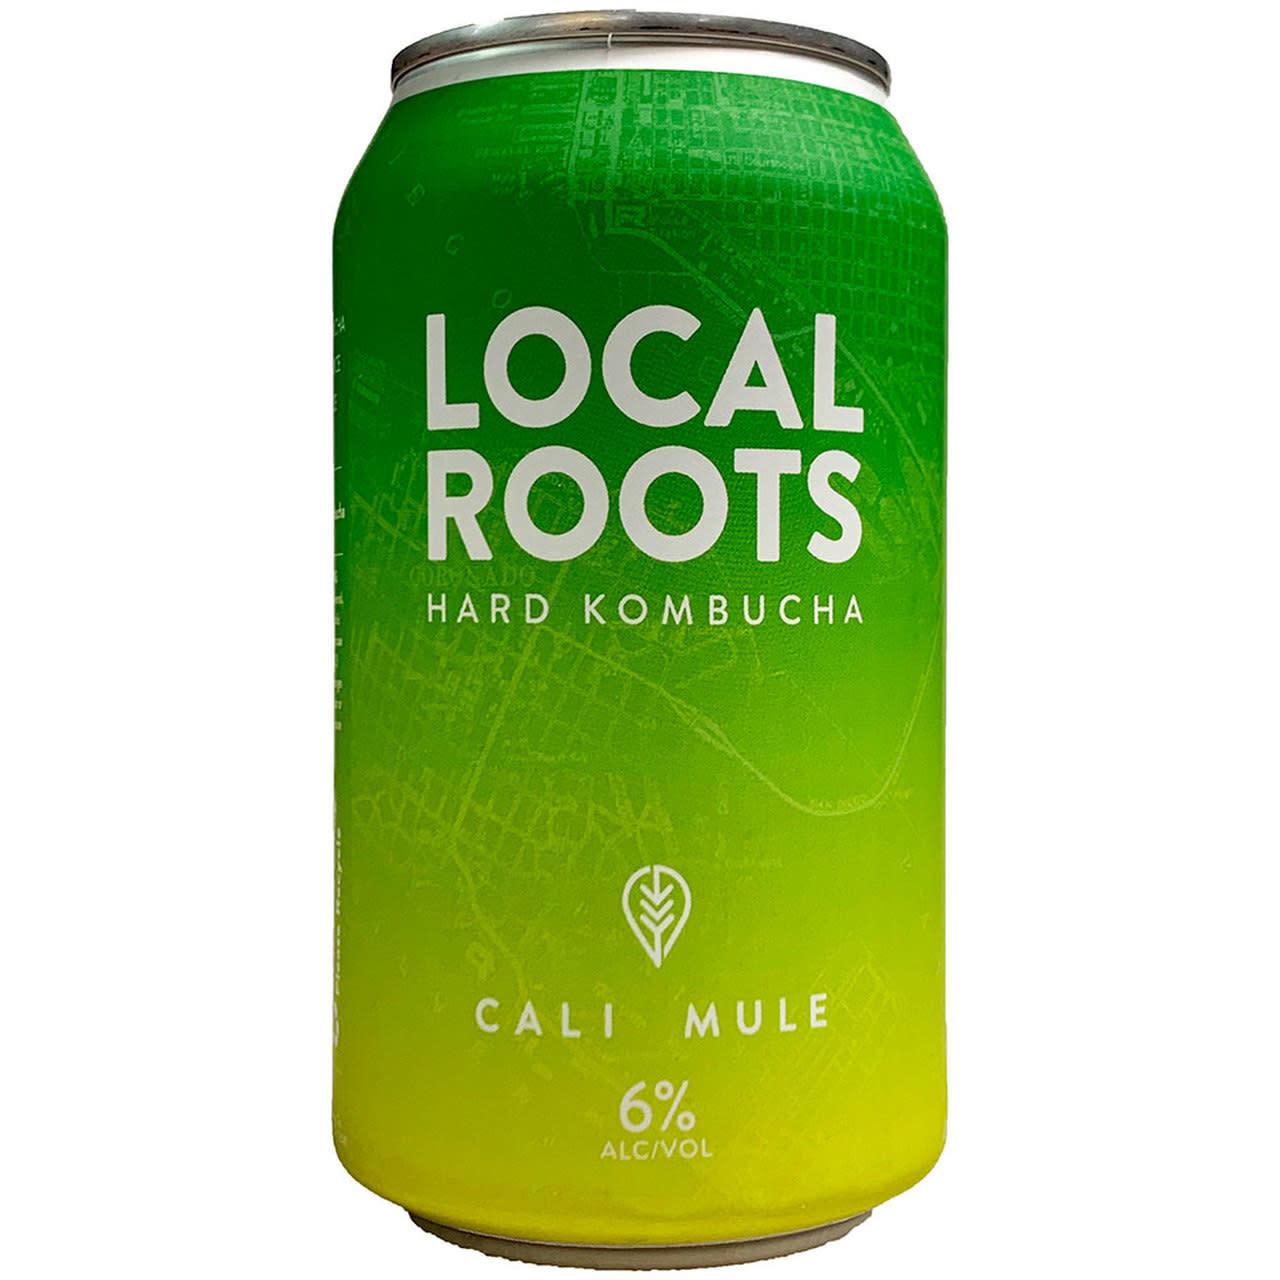 "Local Roots ""Cali Mule"" Hard Kombucha 12oz can- Vista, CA"